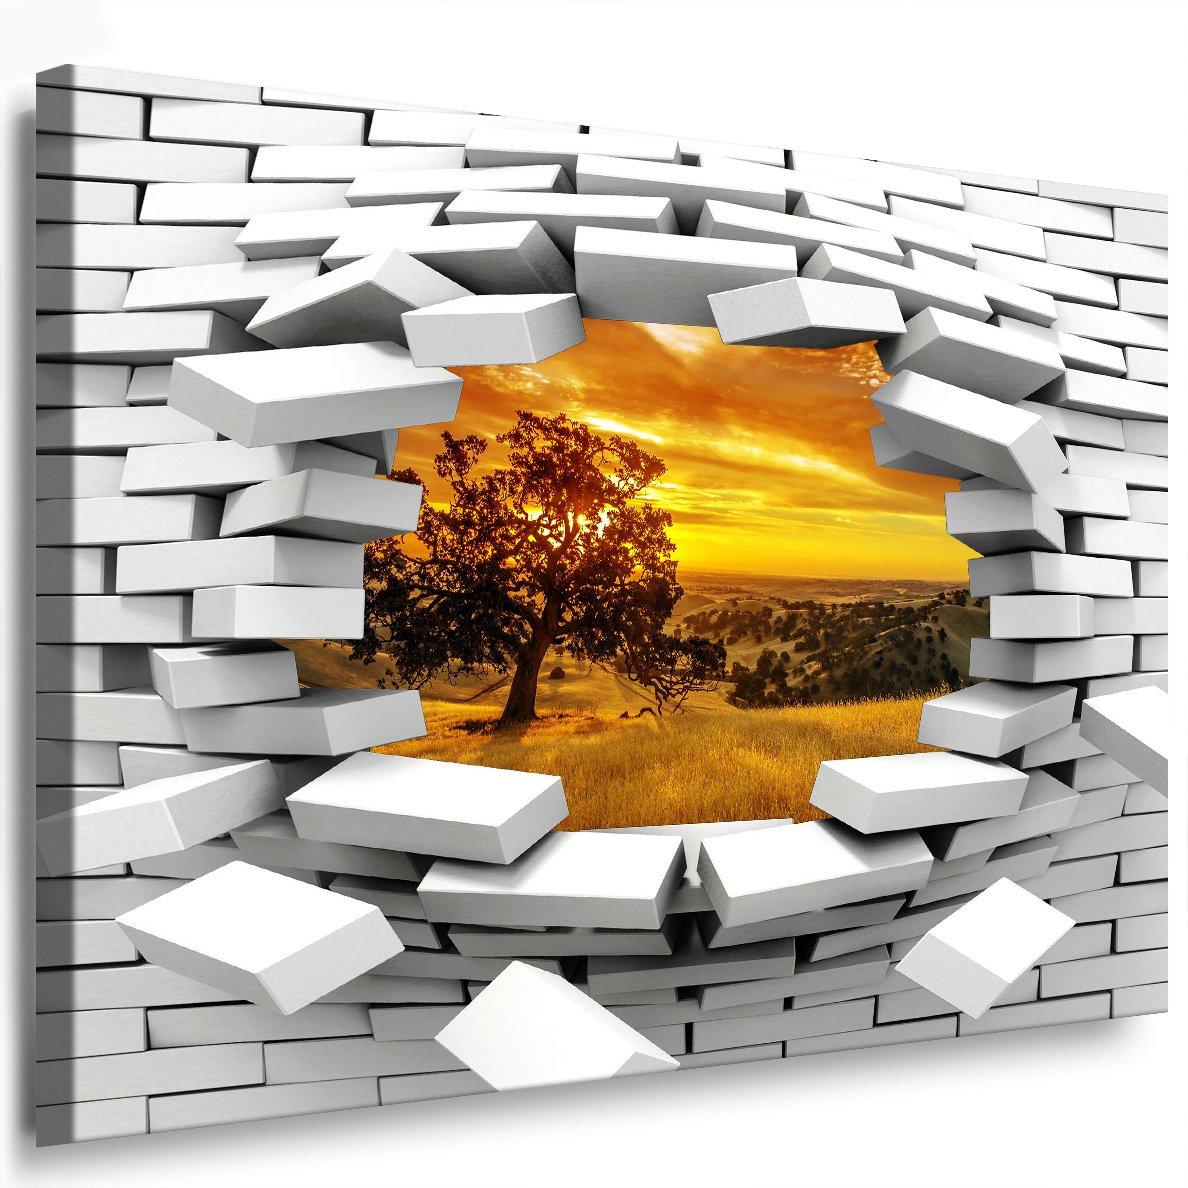 Julia-art Leinwandbilder - Baum, Sonnenuntergang, Landschaft Bild 1 teilig - 120 mal 80 cm Leinwand auf Rahmen - sofort aufhängbar   Wandbild XXL - Kunstdrucke QN.123-6